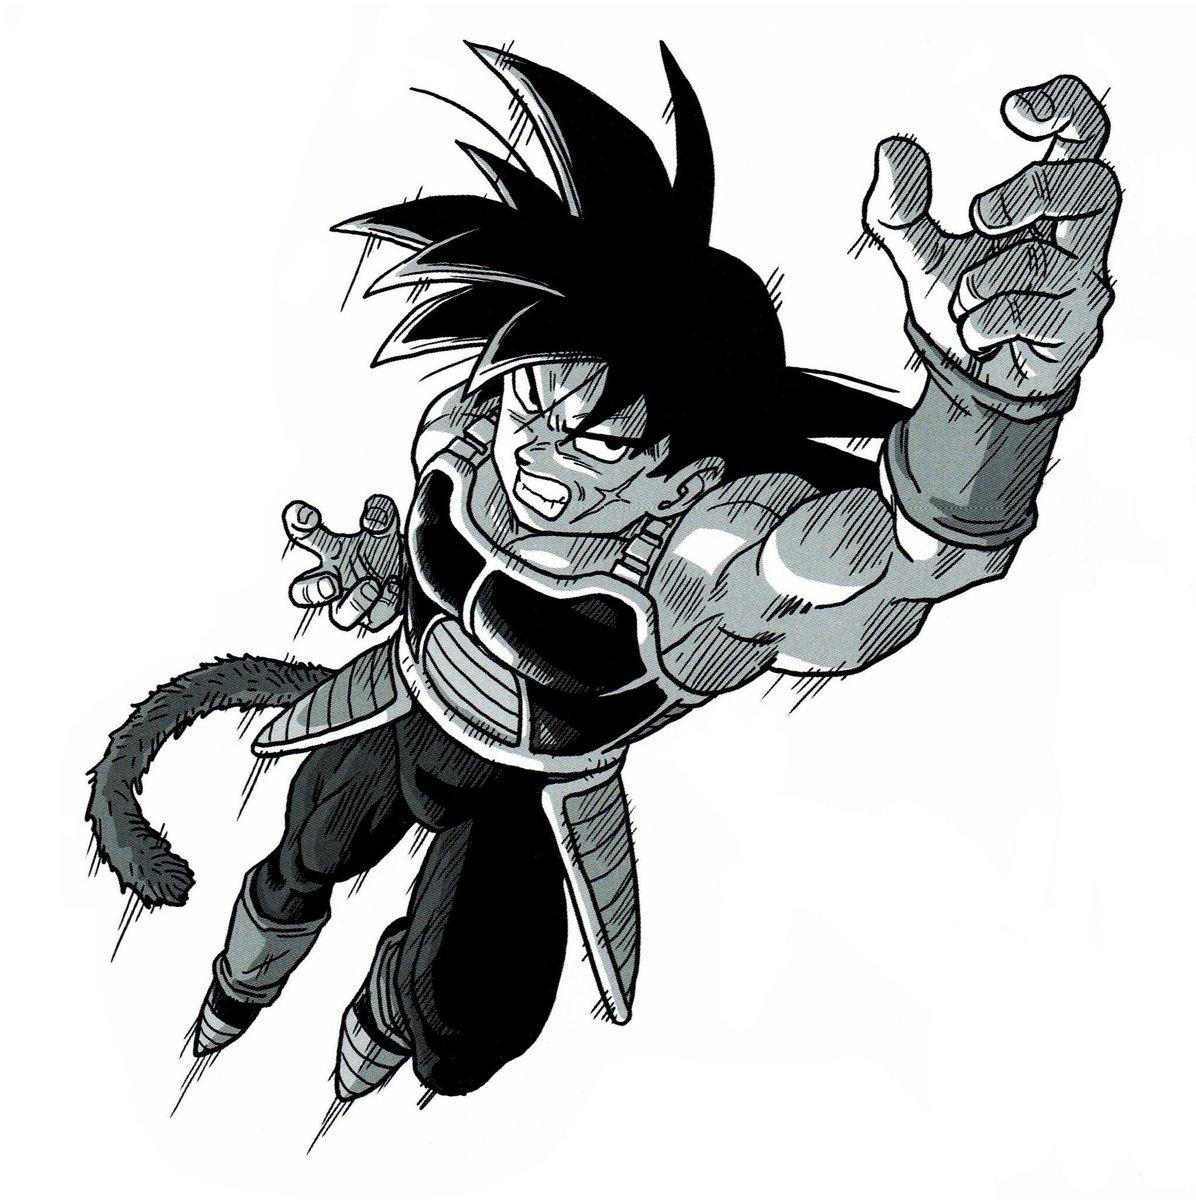 Akira Toriyama Art On Twitter Dragon Ball Z Special Selection Dvd 2011